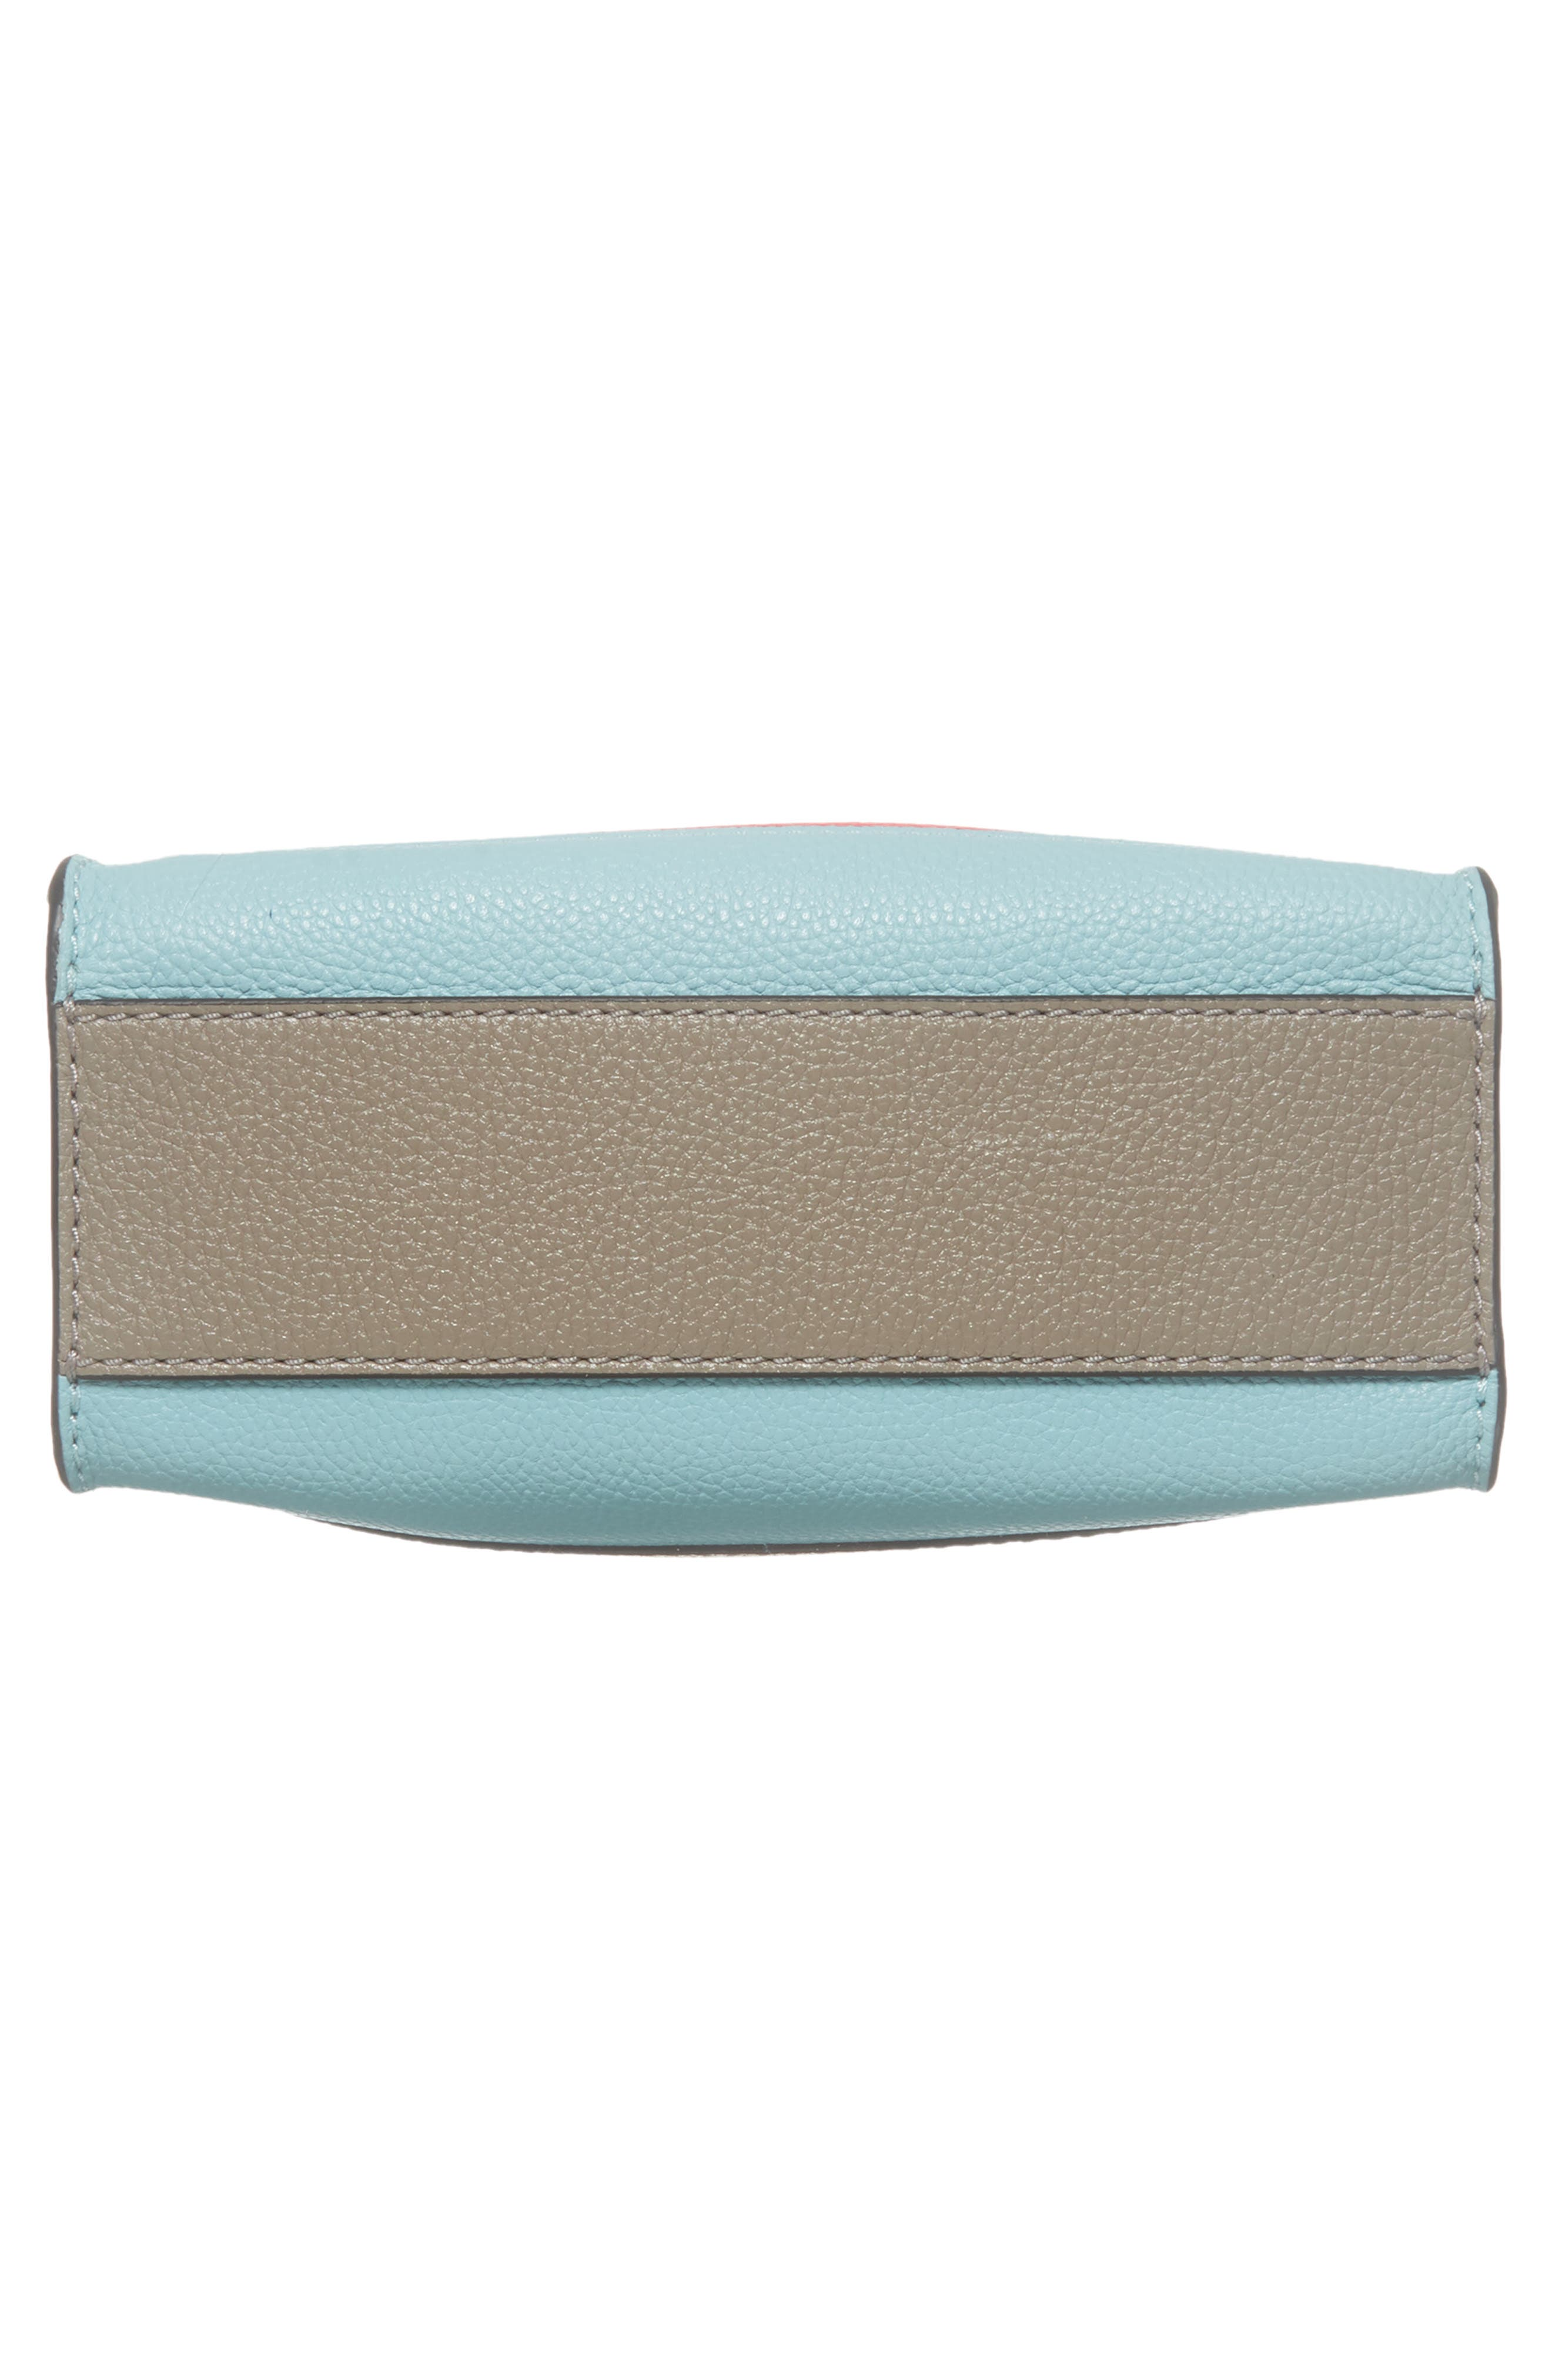 Mini Grid Leather Tote,                             Alternate thumbnail 6, color,